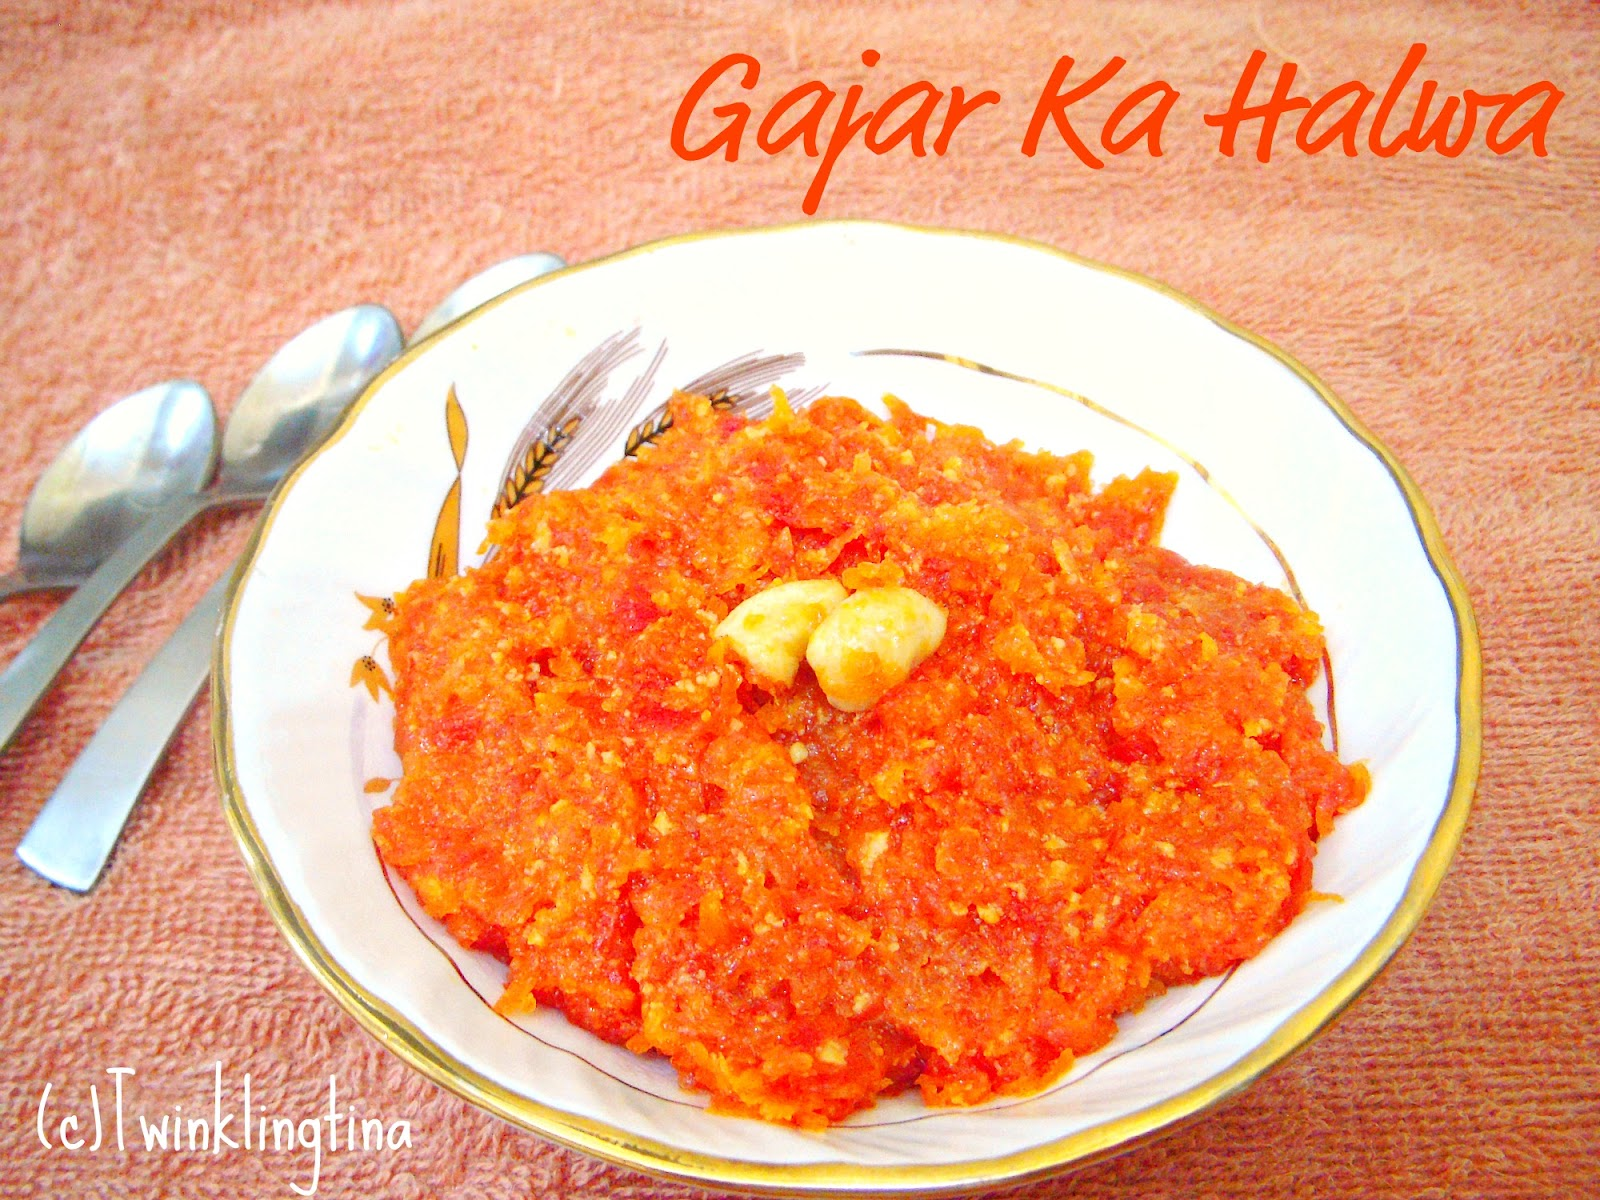 carrot kheer, indian dessert, gajar ka halwa, carrot halwa